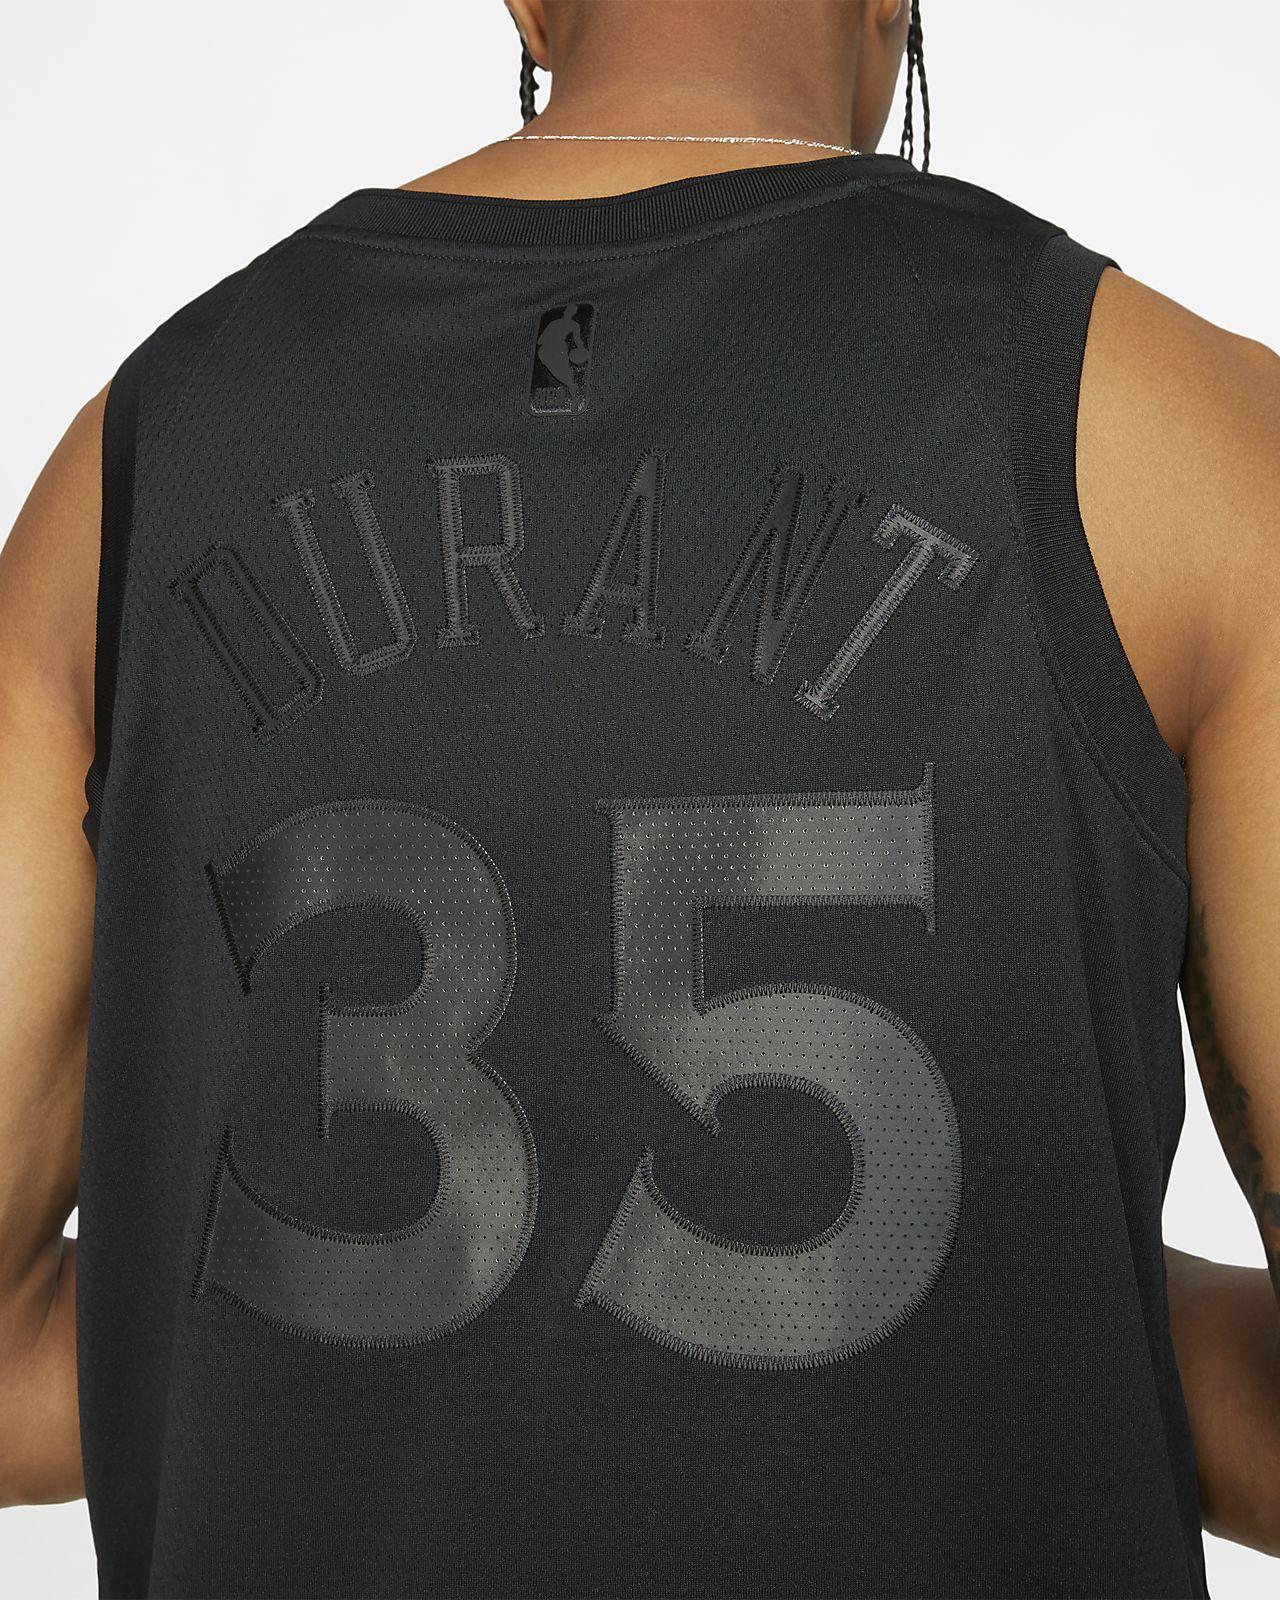 dcb5f2326 ... Kevin Durant MVP Swingman (Golden State Warriors) Men s Nike NBA  Connected Jersey